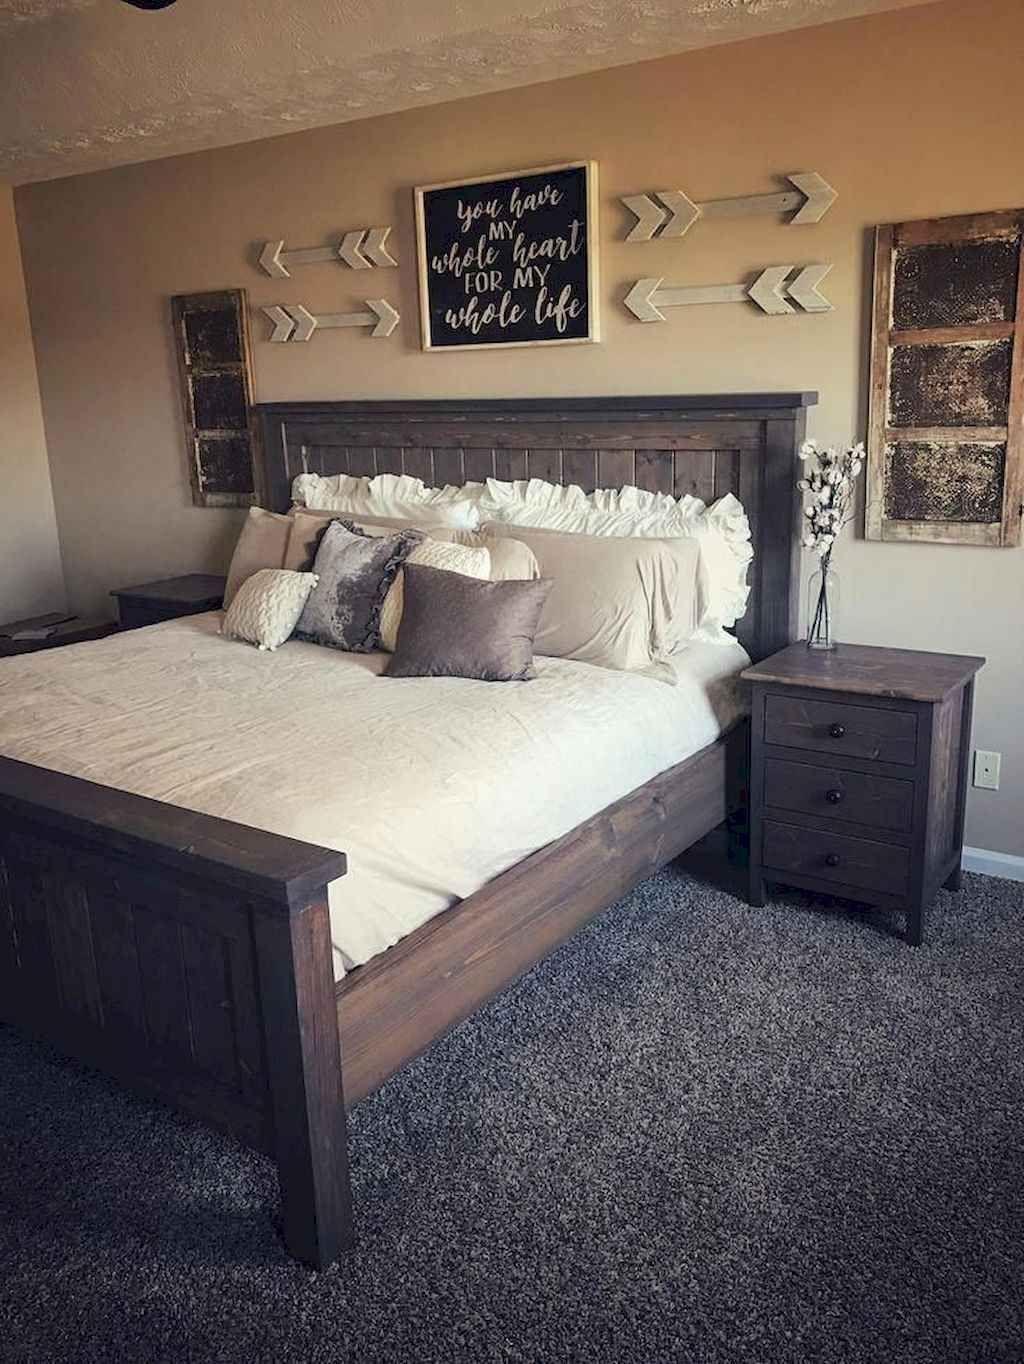 56 Modern Farmhouse Bedroom Ideas In 2020 Rustic Bedroom Master